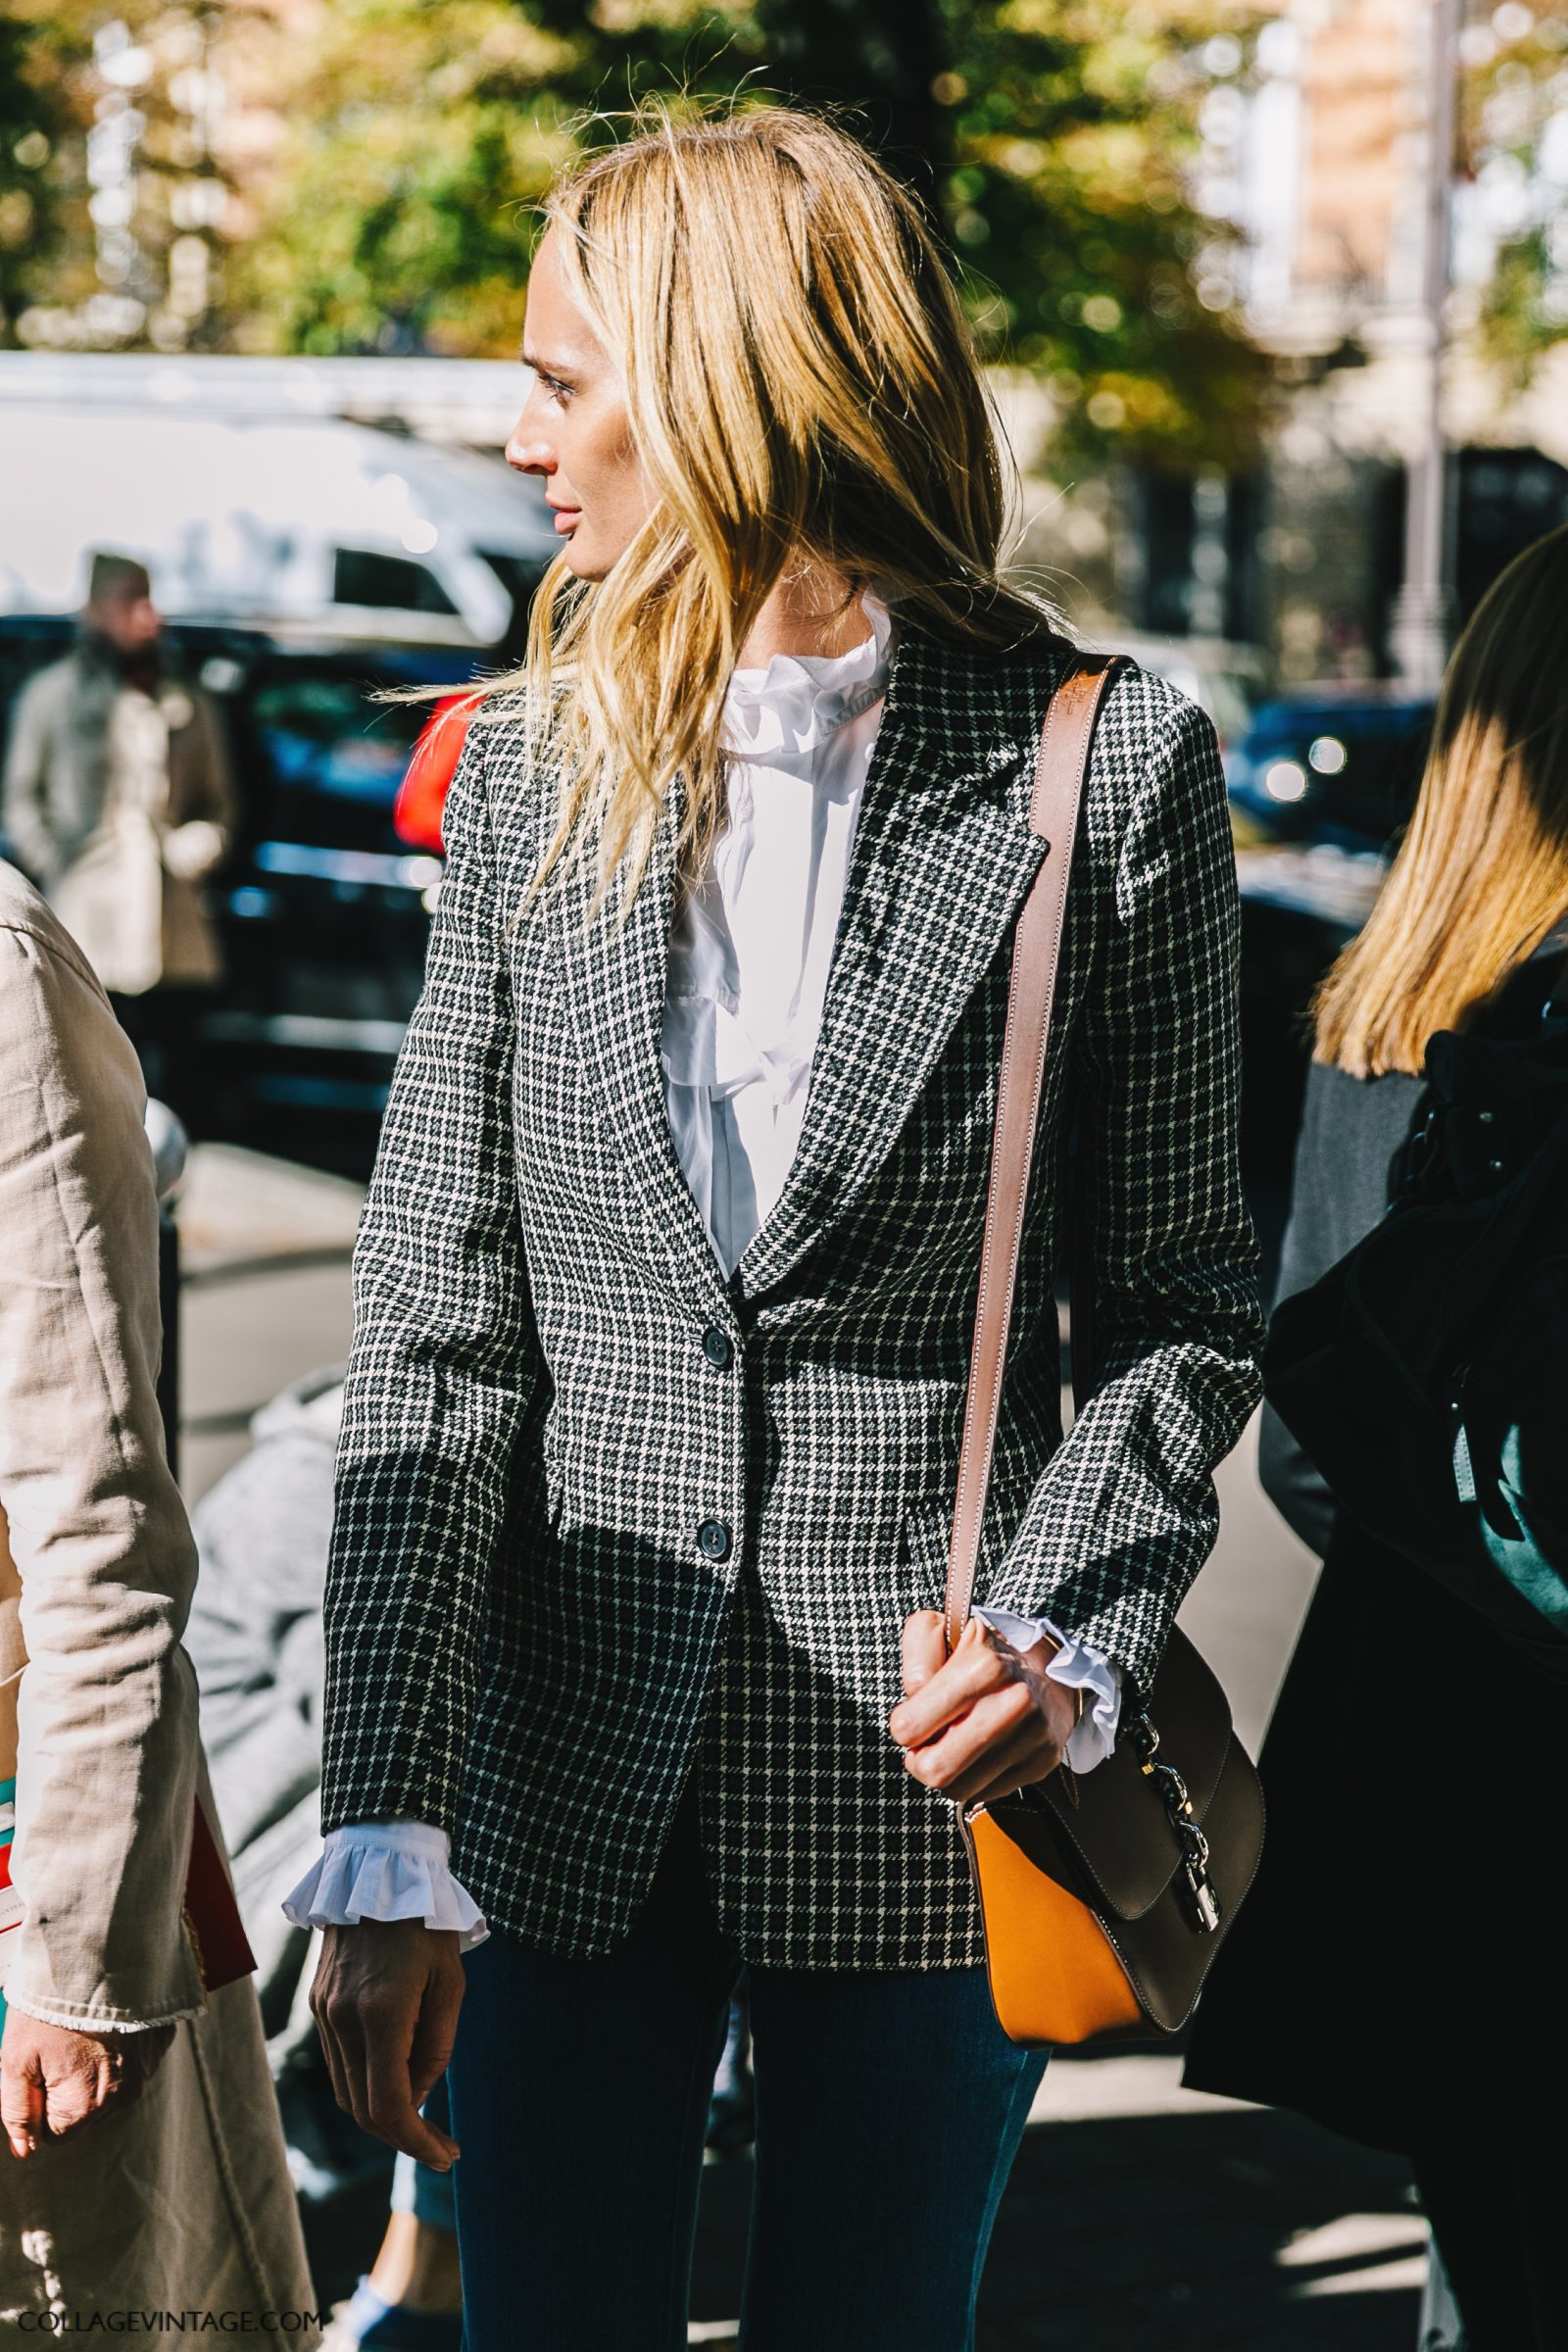 pfw-paris_fashion_week_ss17-street_style-outfit-collage_vintage-louis_vuitton-miu_miu-59